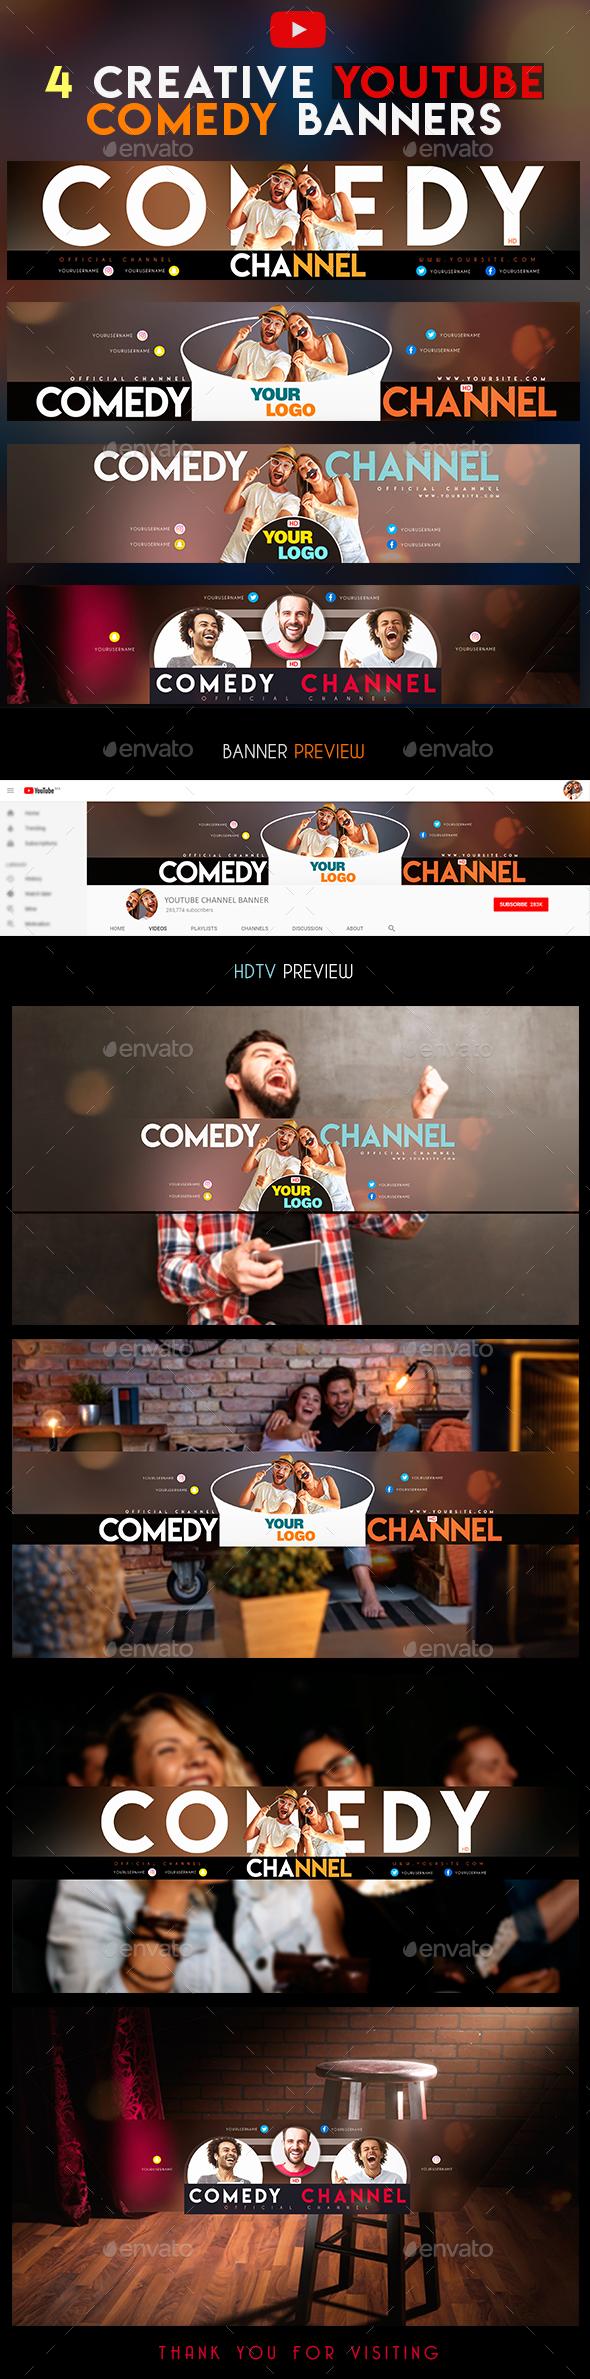 YouTube Comedy Banner - YouTube Social Media